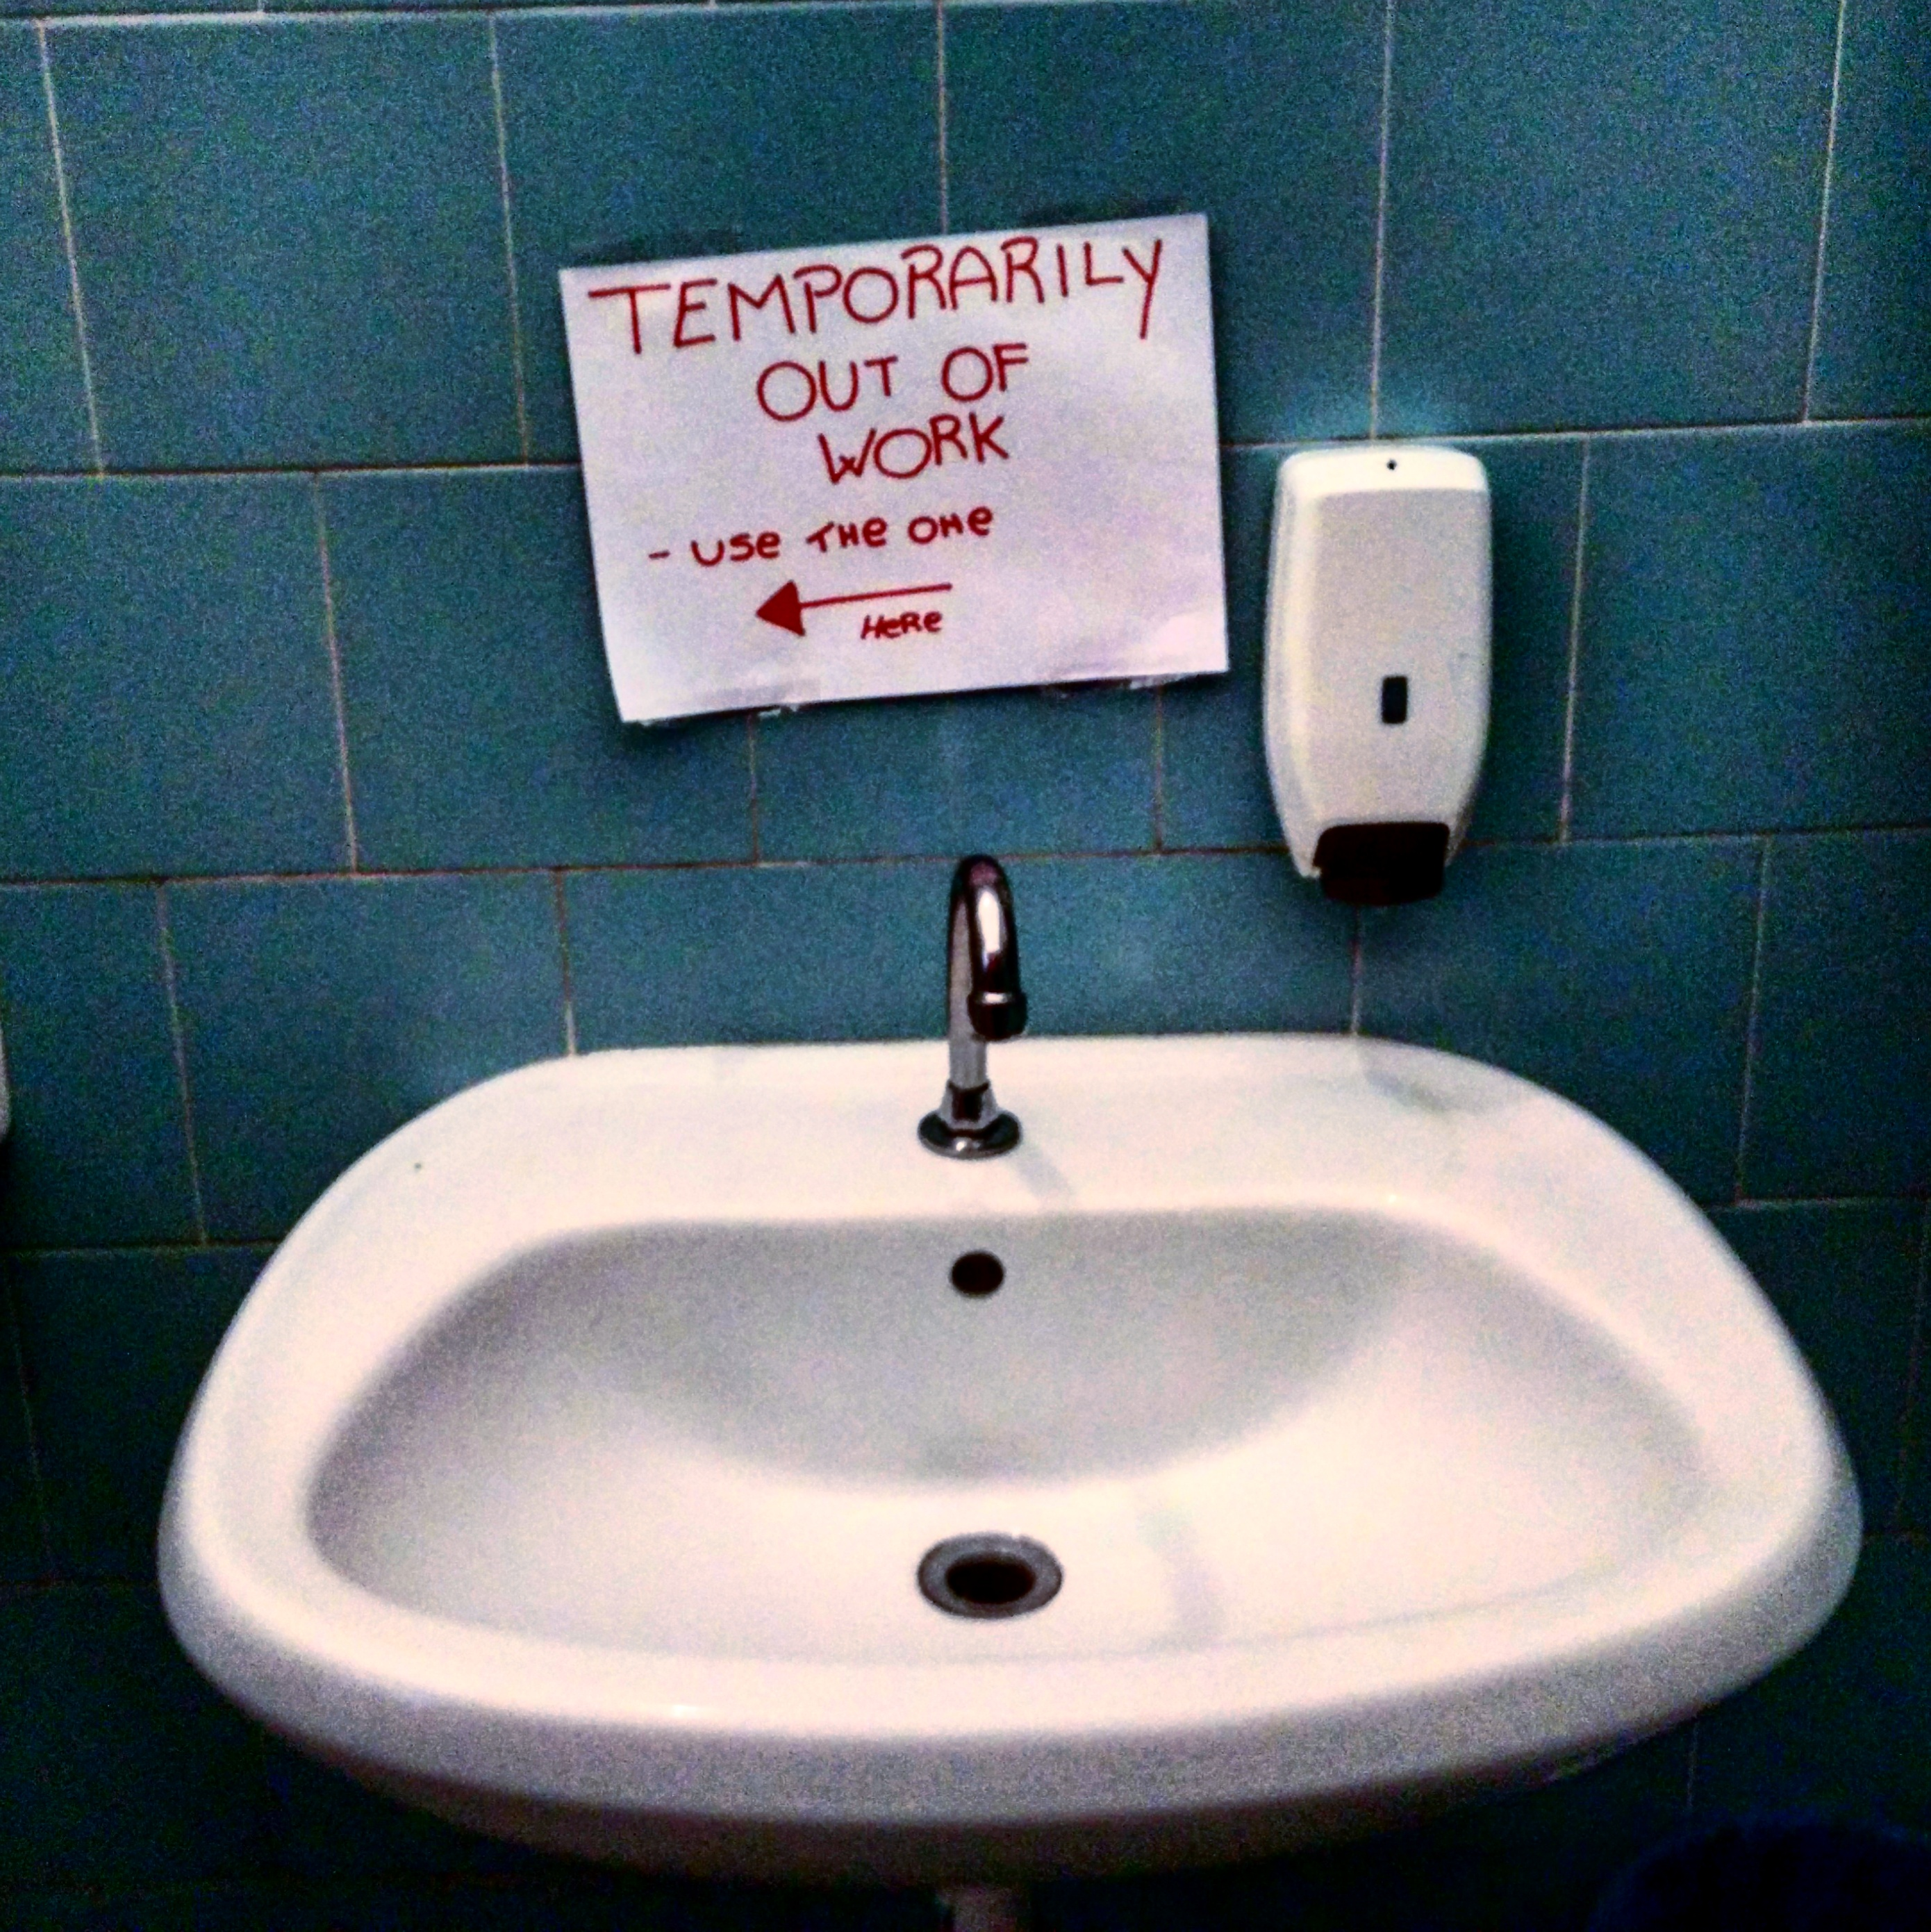 Bathroom Signs Wikipedia file:bathroom sign at wikimania 2016 - wikimedia commons